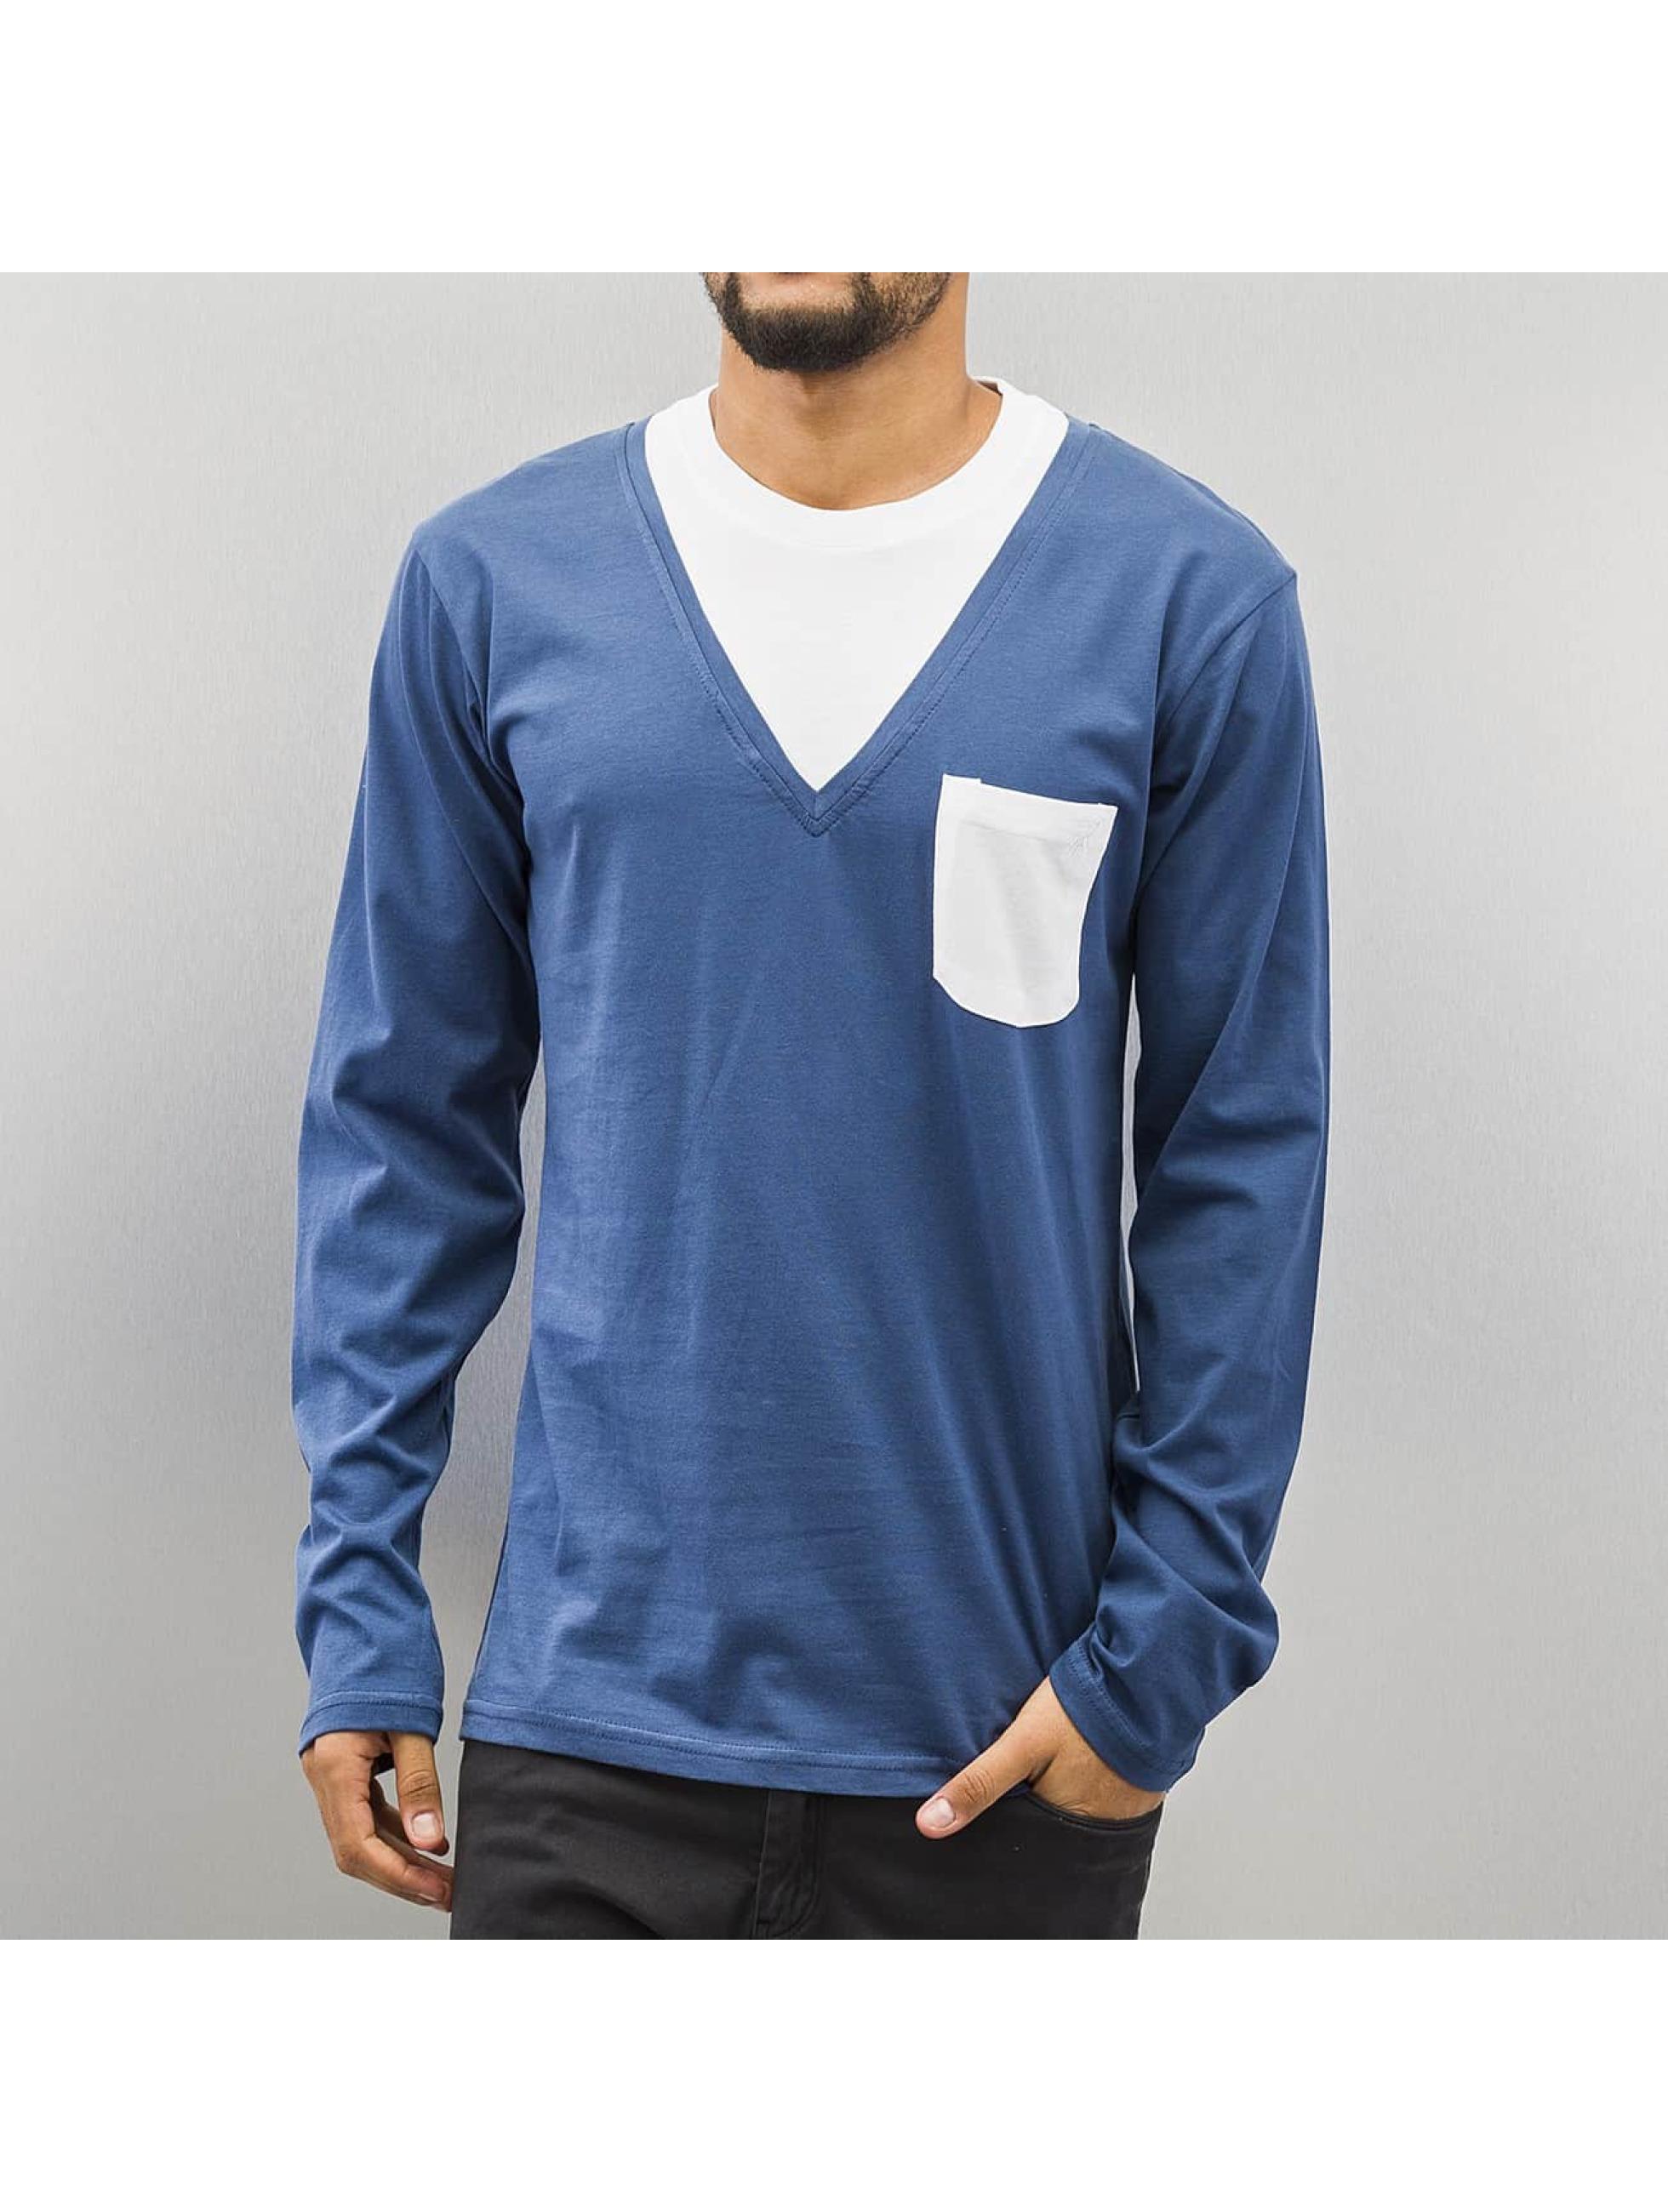 Cazzy Clang Pitkähihaiset paidat Breast Pocket sininen